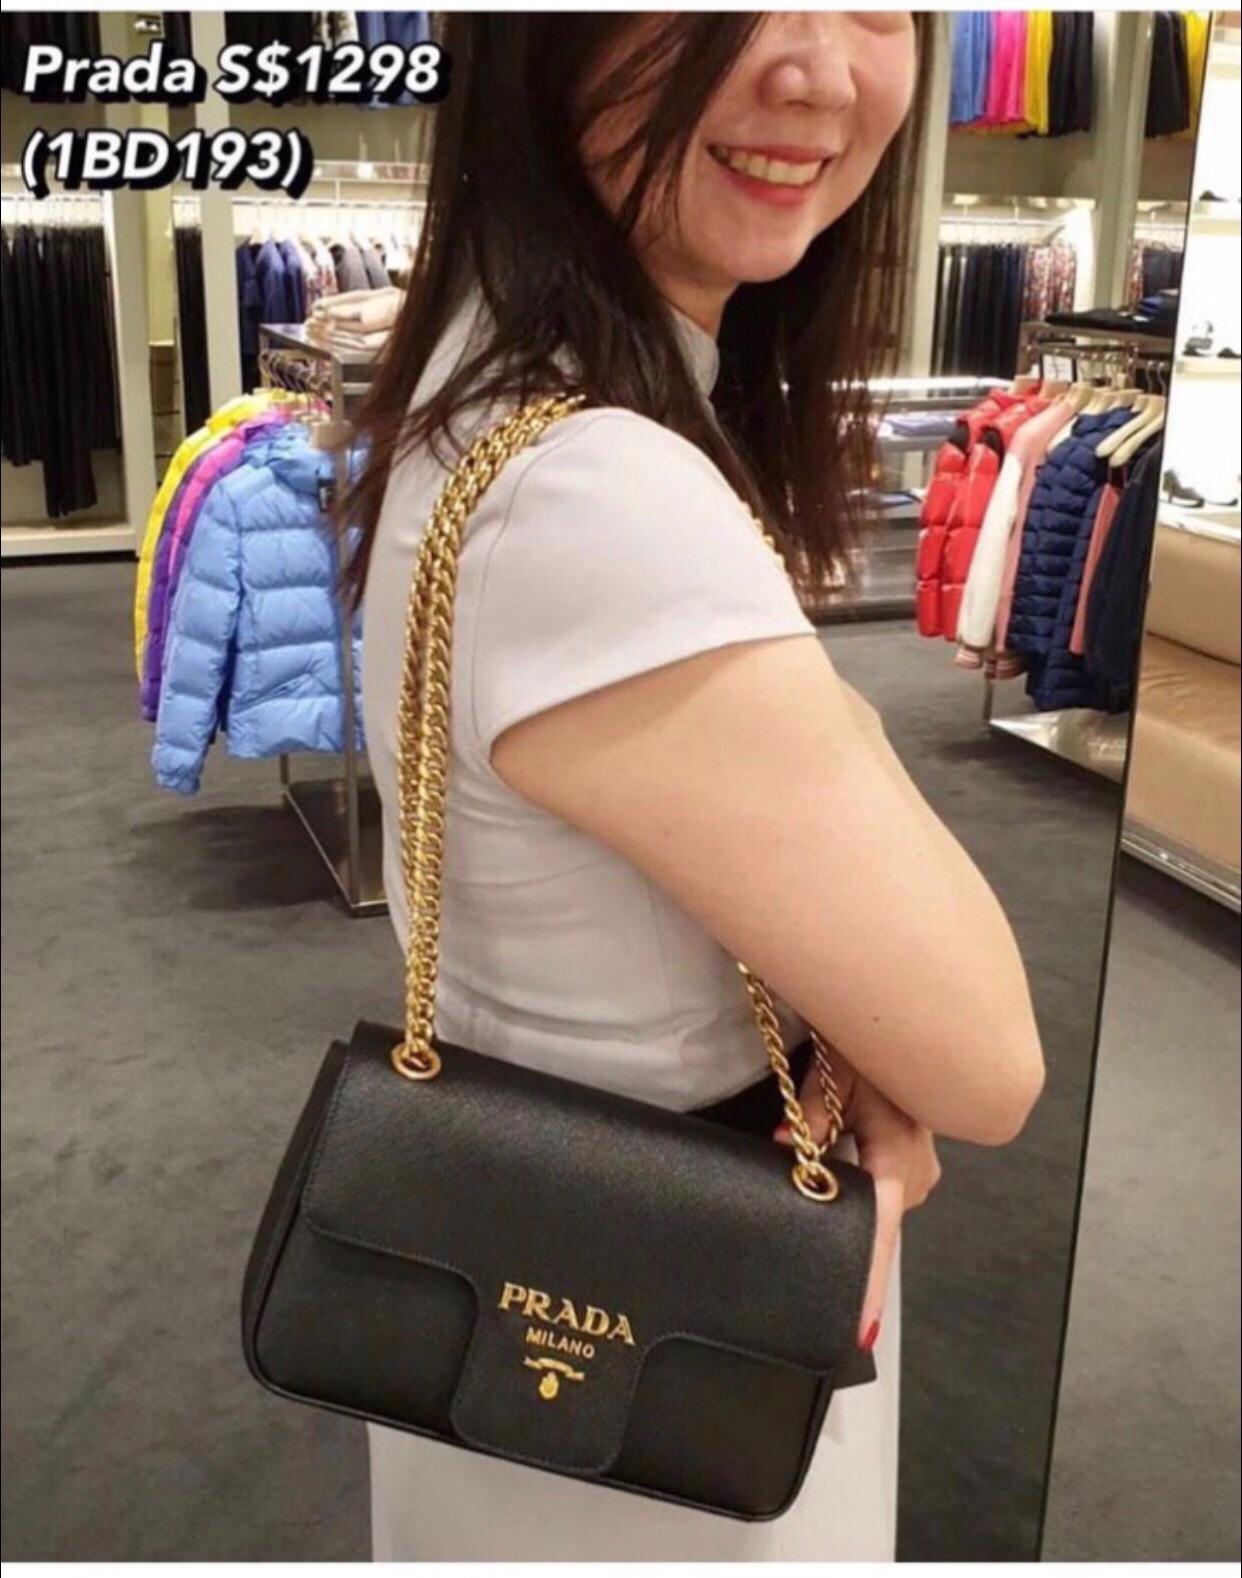 Prada 1BD193 Shoulder Bag